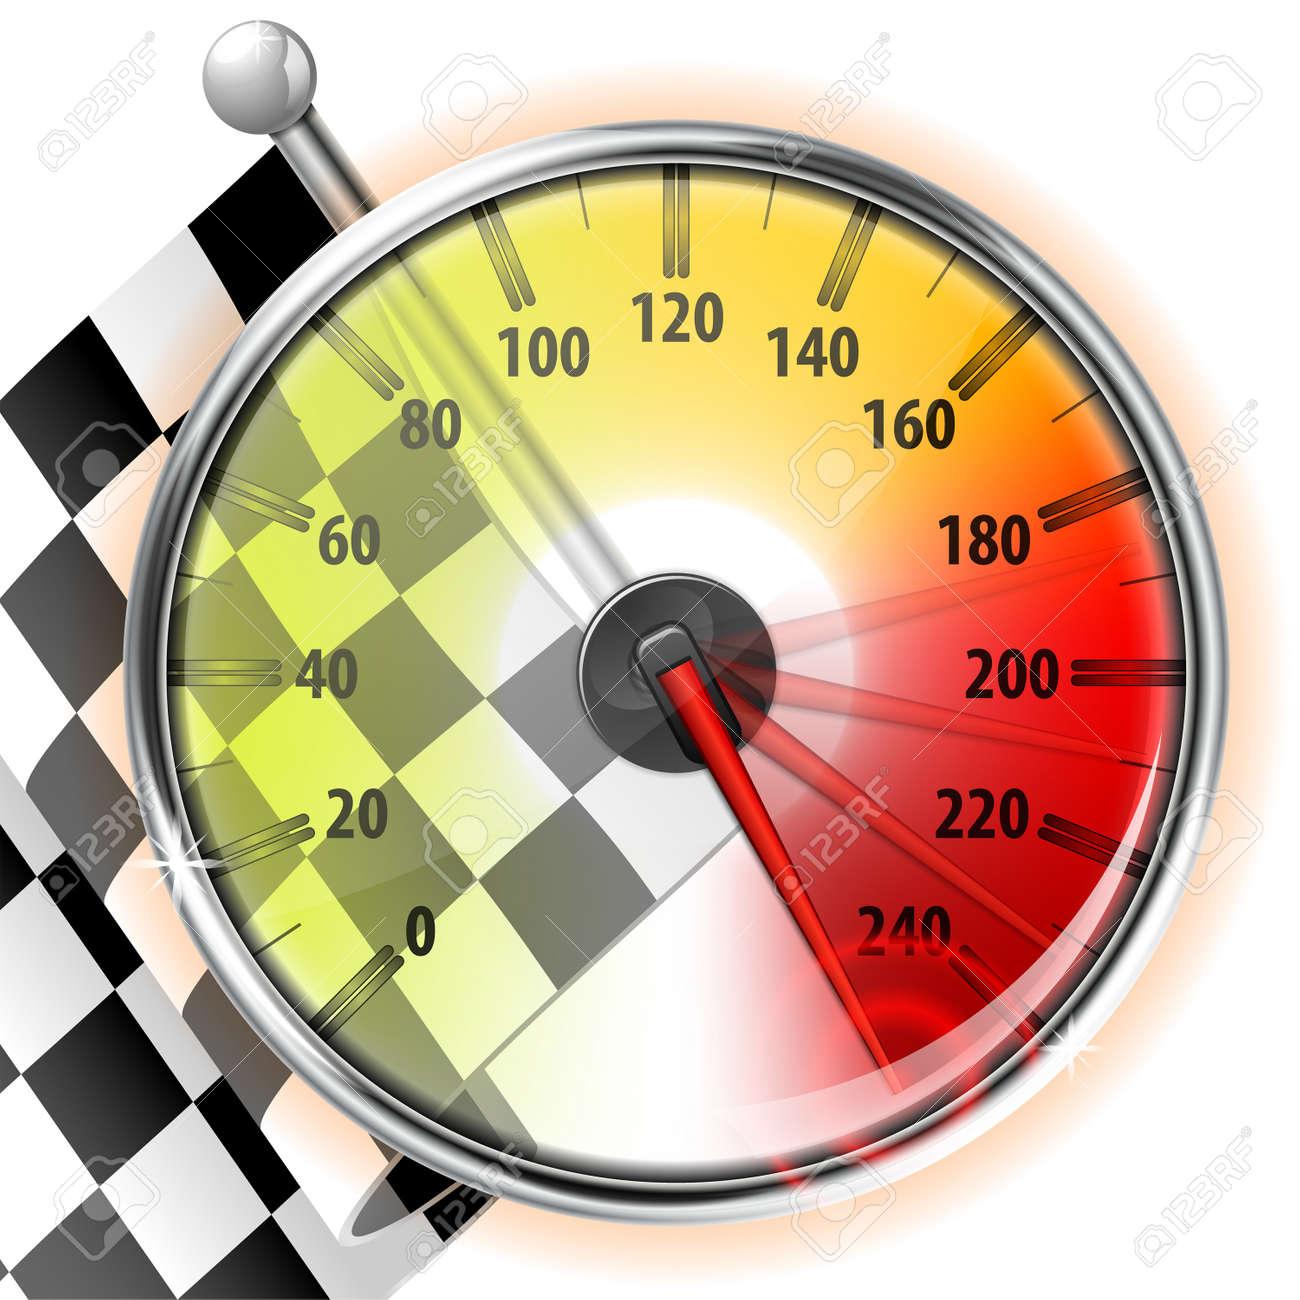 Concept Winner Champion Detailed Car Speedometer With Maximum